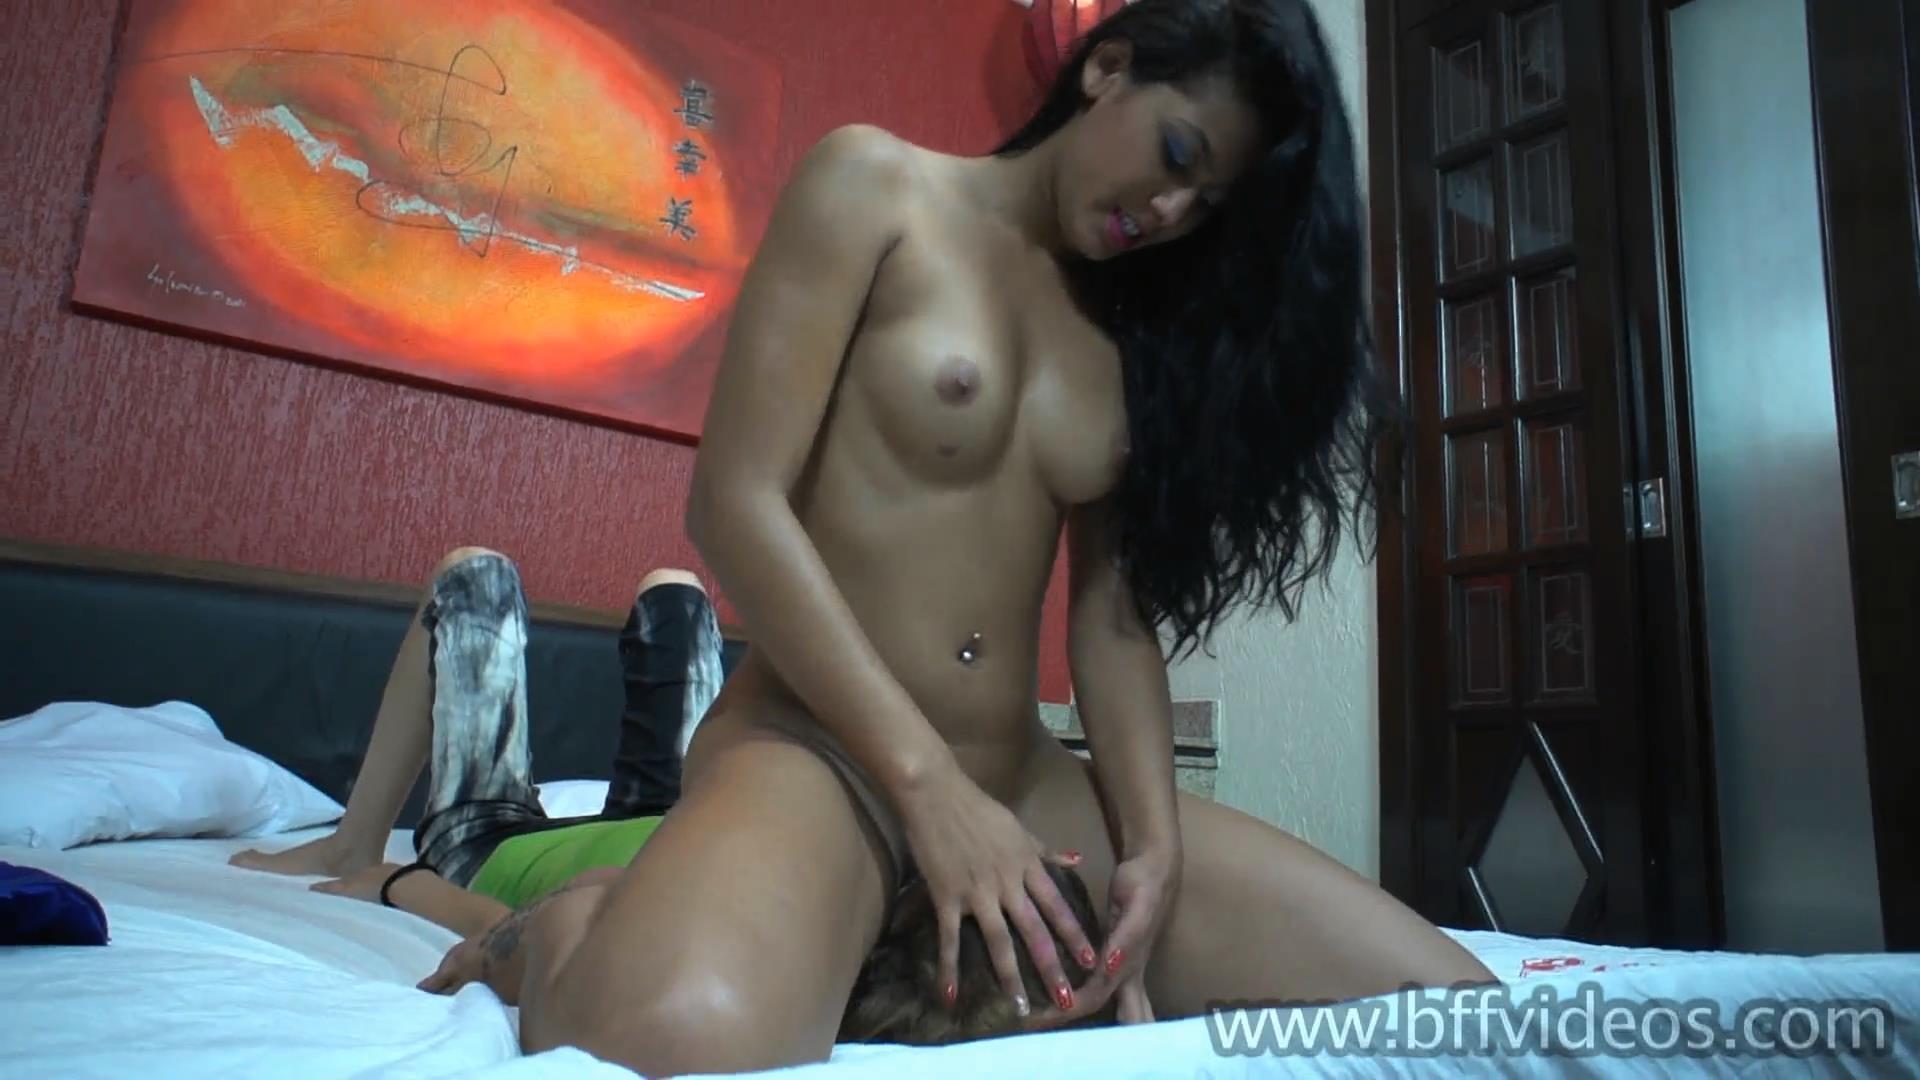 Slave Melissa, Domme Nicolli In Scene: Nicolli Fucks Melissa Face With Spit - BFFVIDEOS - FULL HD/1080p/MP4